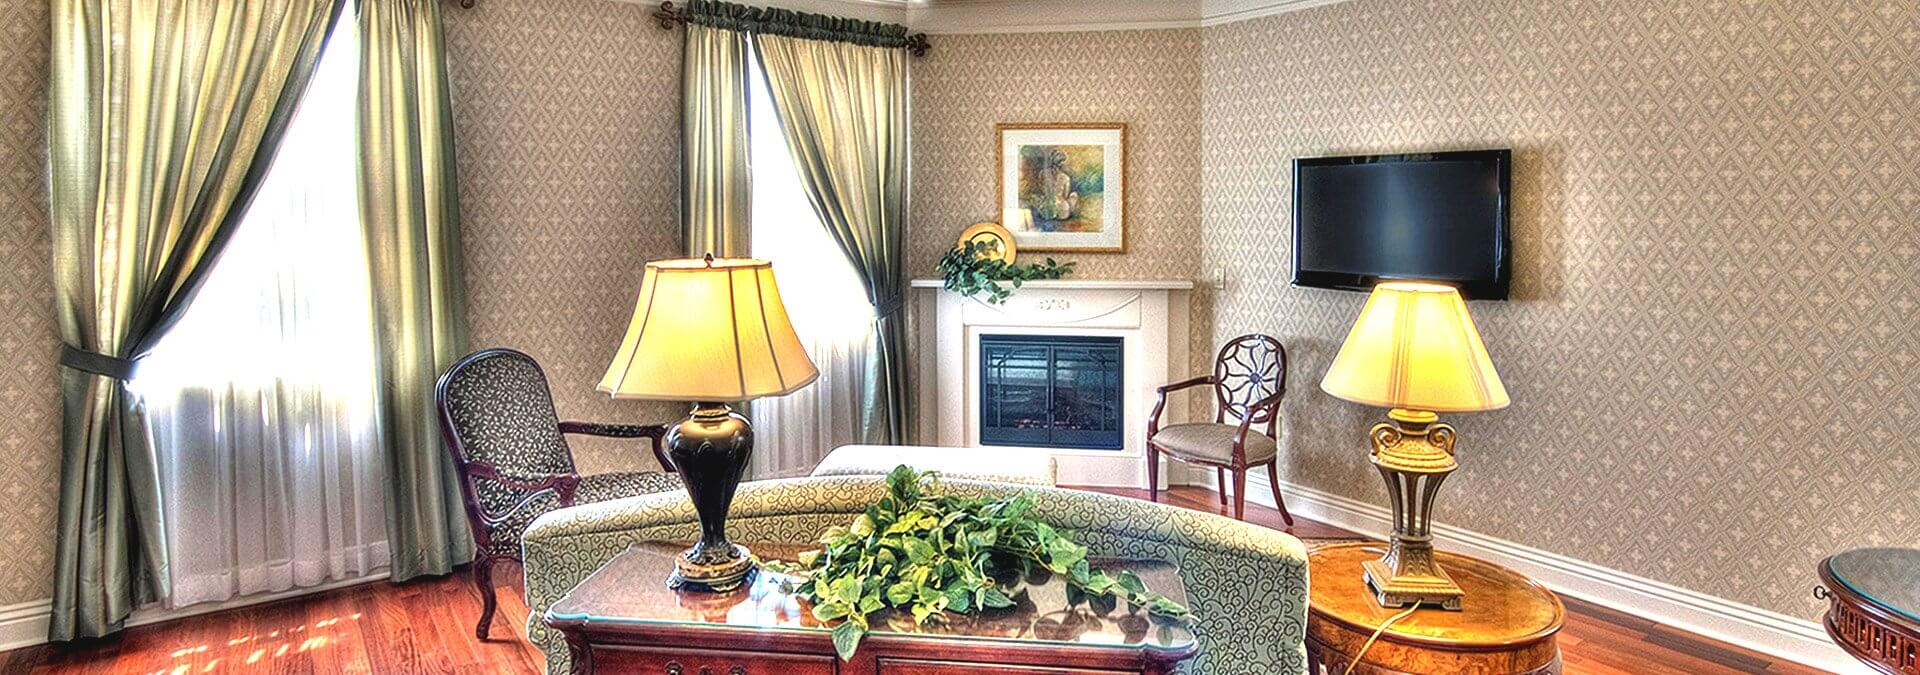 Boutique Luxury Hotel In Wabash Indiana Charley Creek Inn